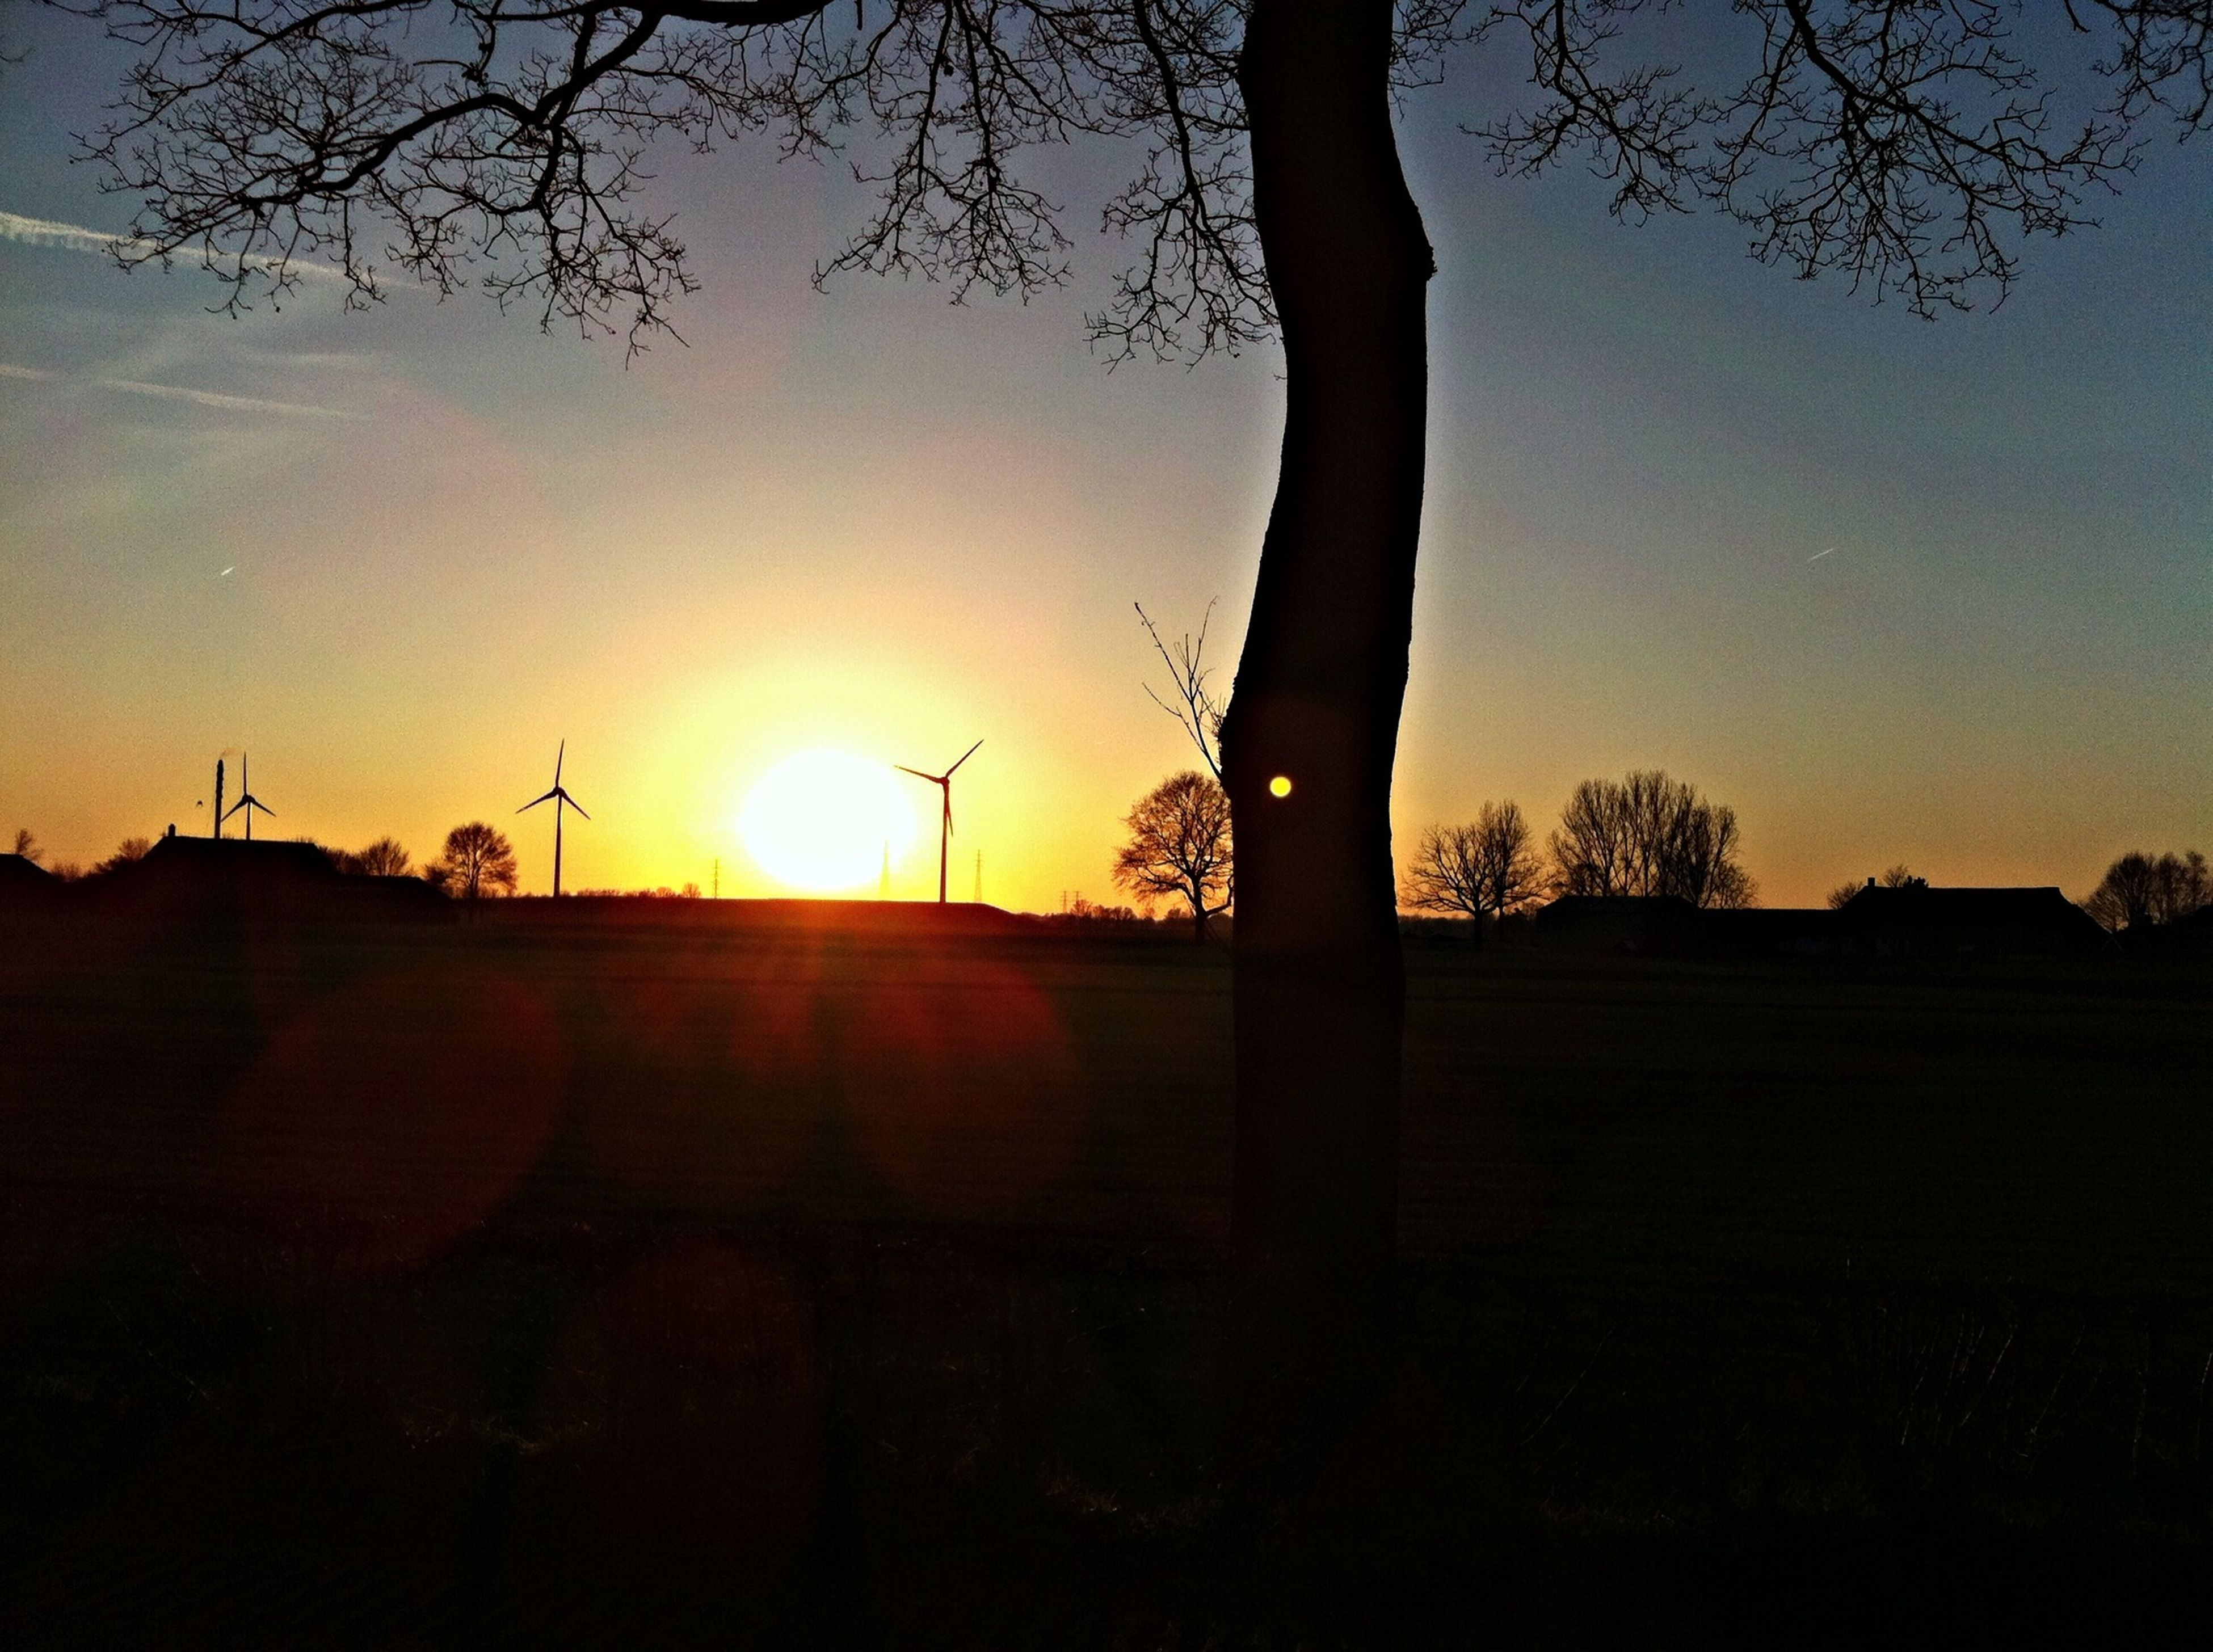 silhouette, sunset, tree, sun, bare tree, tranquility, clear sky, tranquil scene, sunlight, nature, scenics, landscape, dark, beauty in nature, branch, orange color, sky, lens flare, sunbeam, copy space